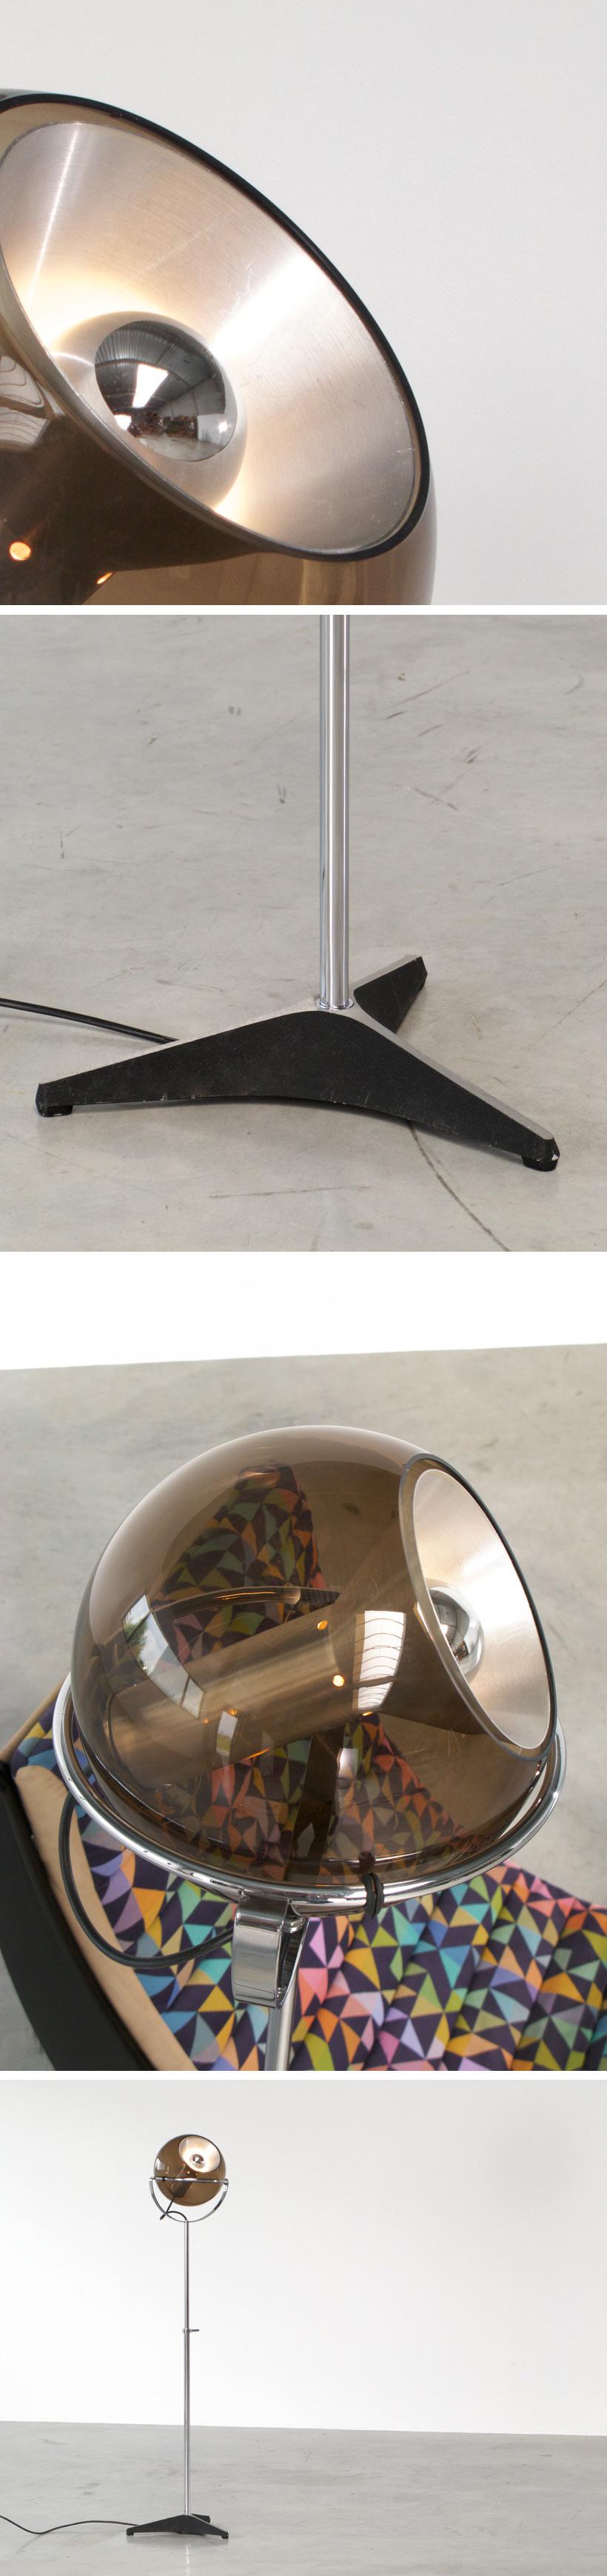 Adjustable Raak Globe Sphere 2000 floor lamp Large